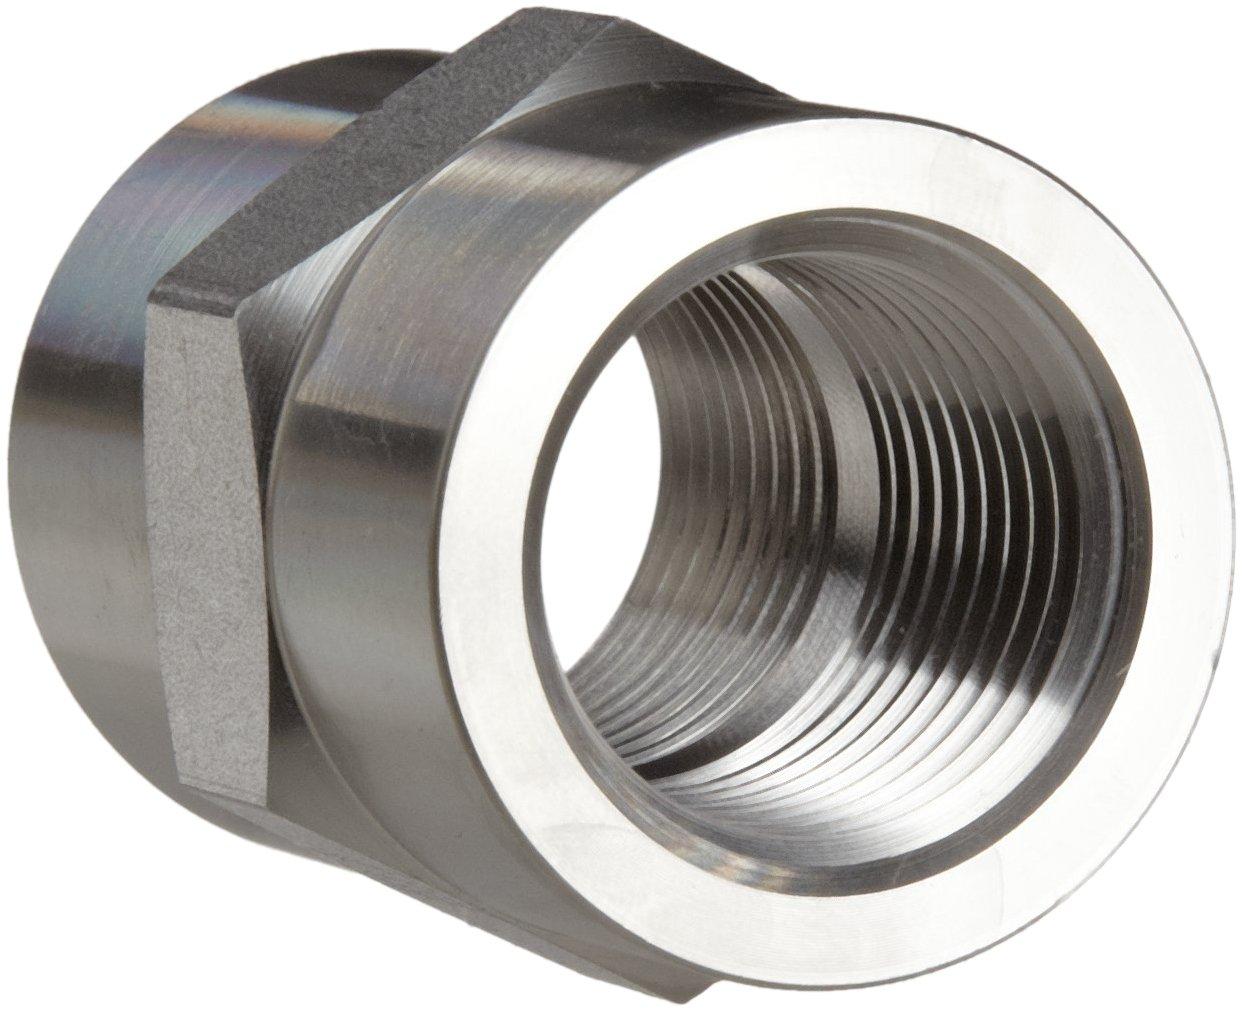 Parker Stainless Steel 316 Pipe Fitting, Hex Coupling, 1/2'' NPT Female X 1/2'' NPT Female